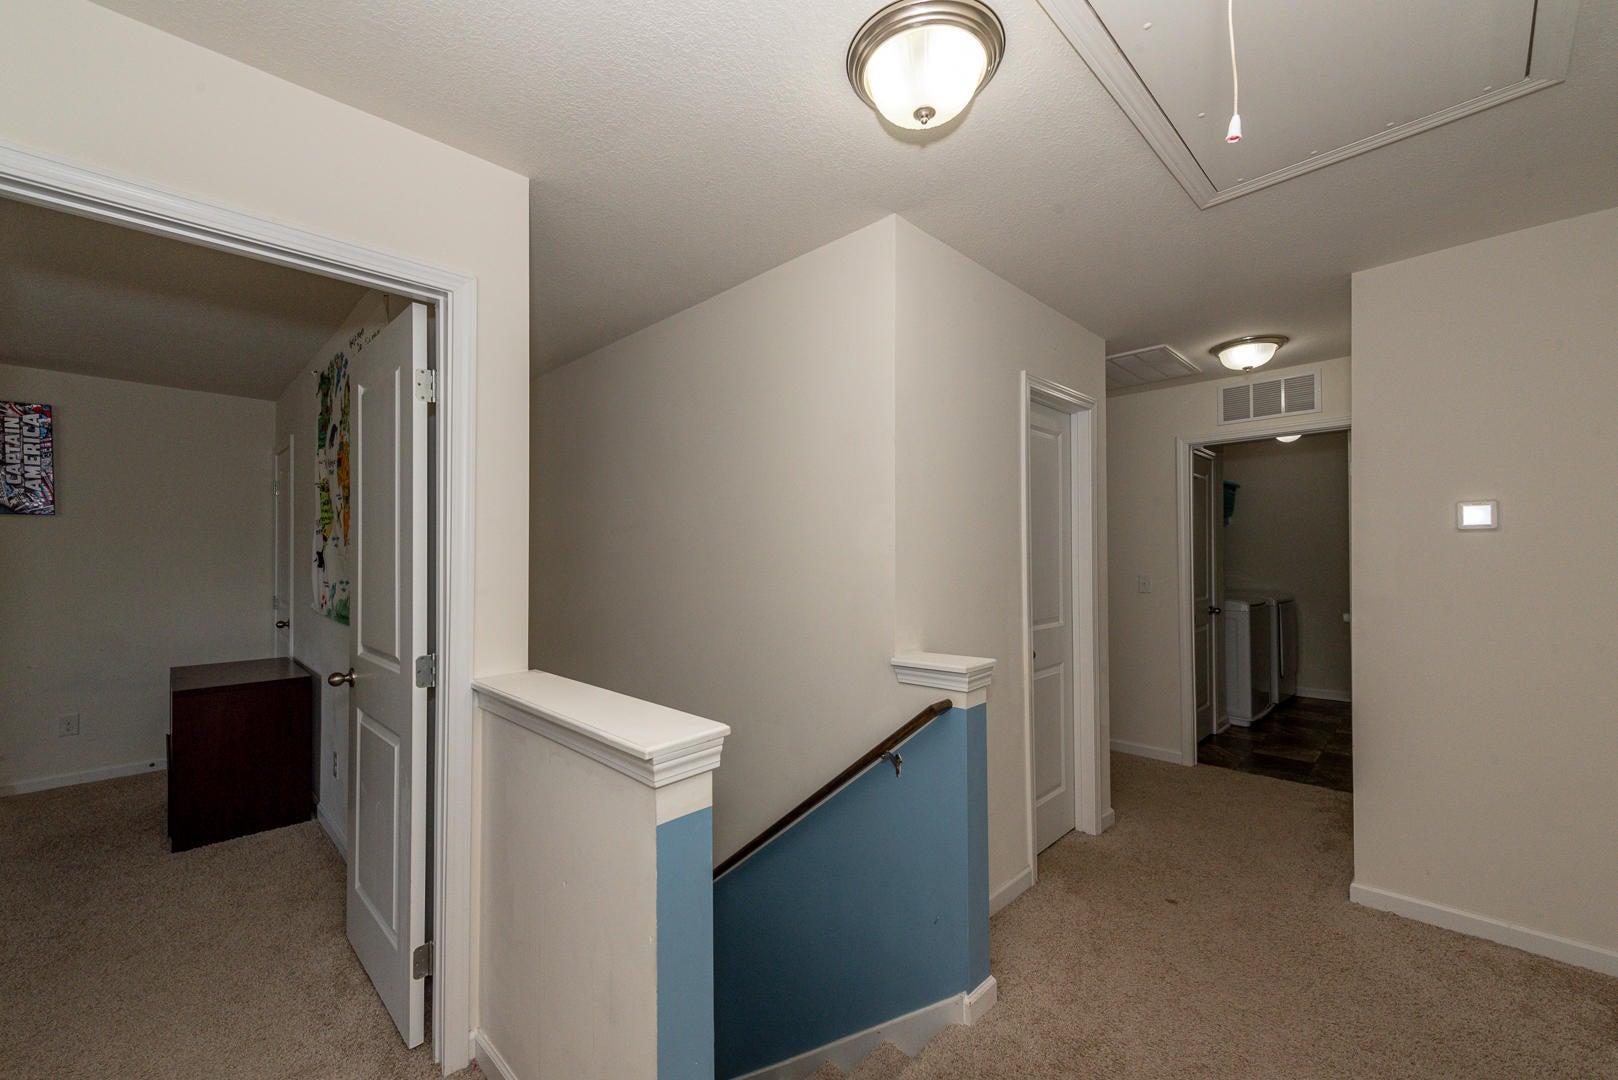 Upper hall area